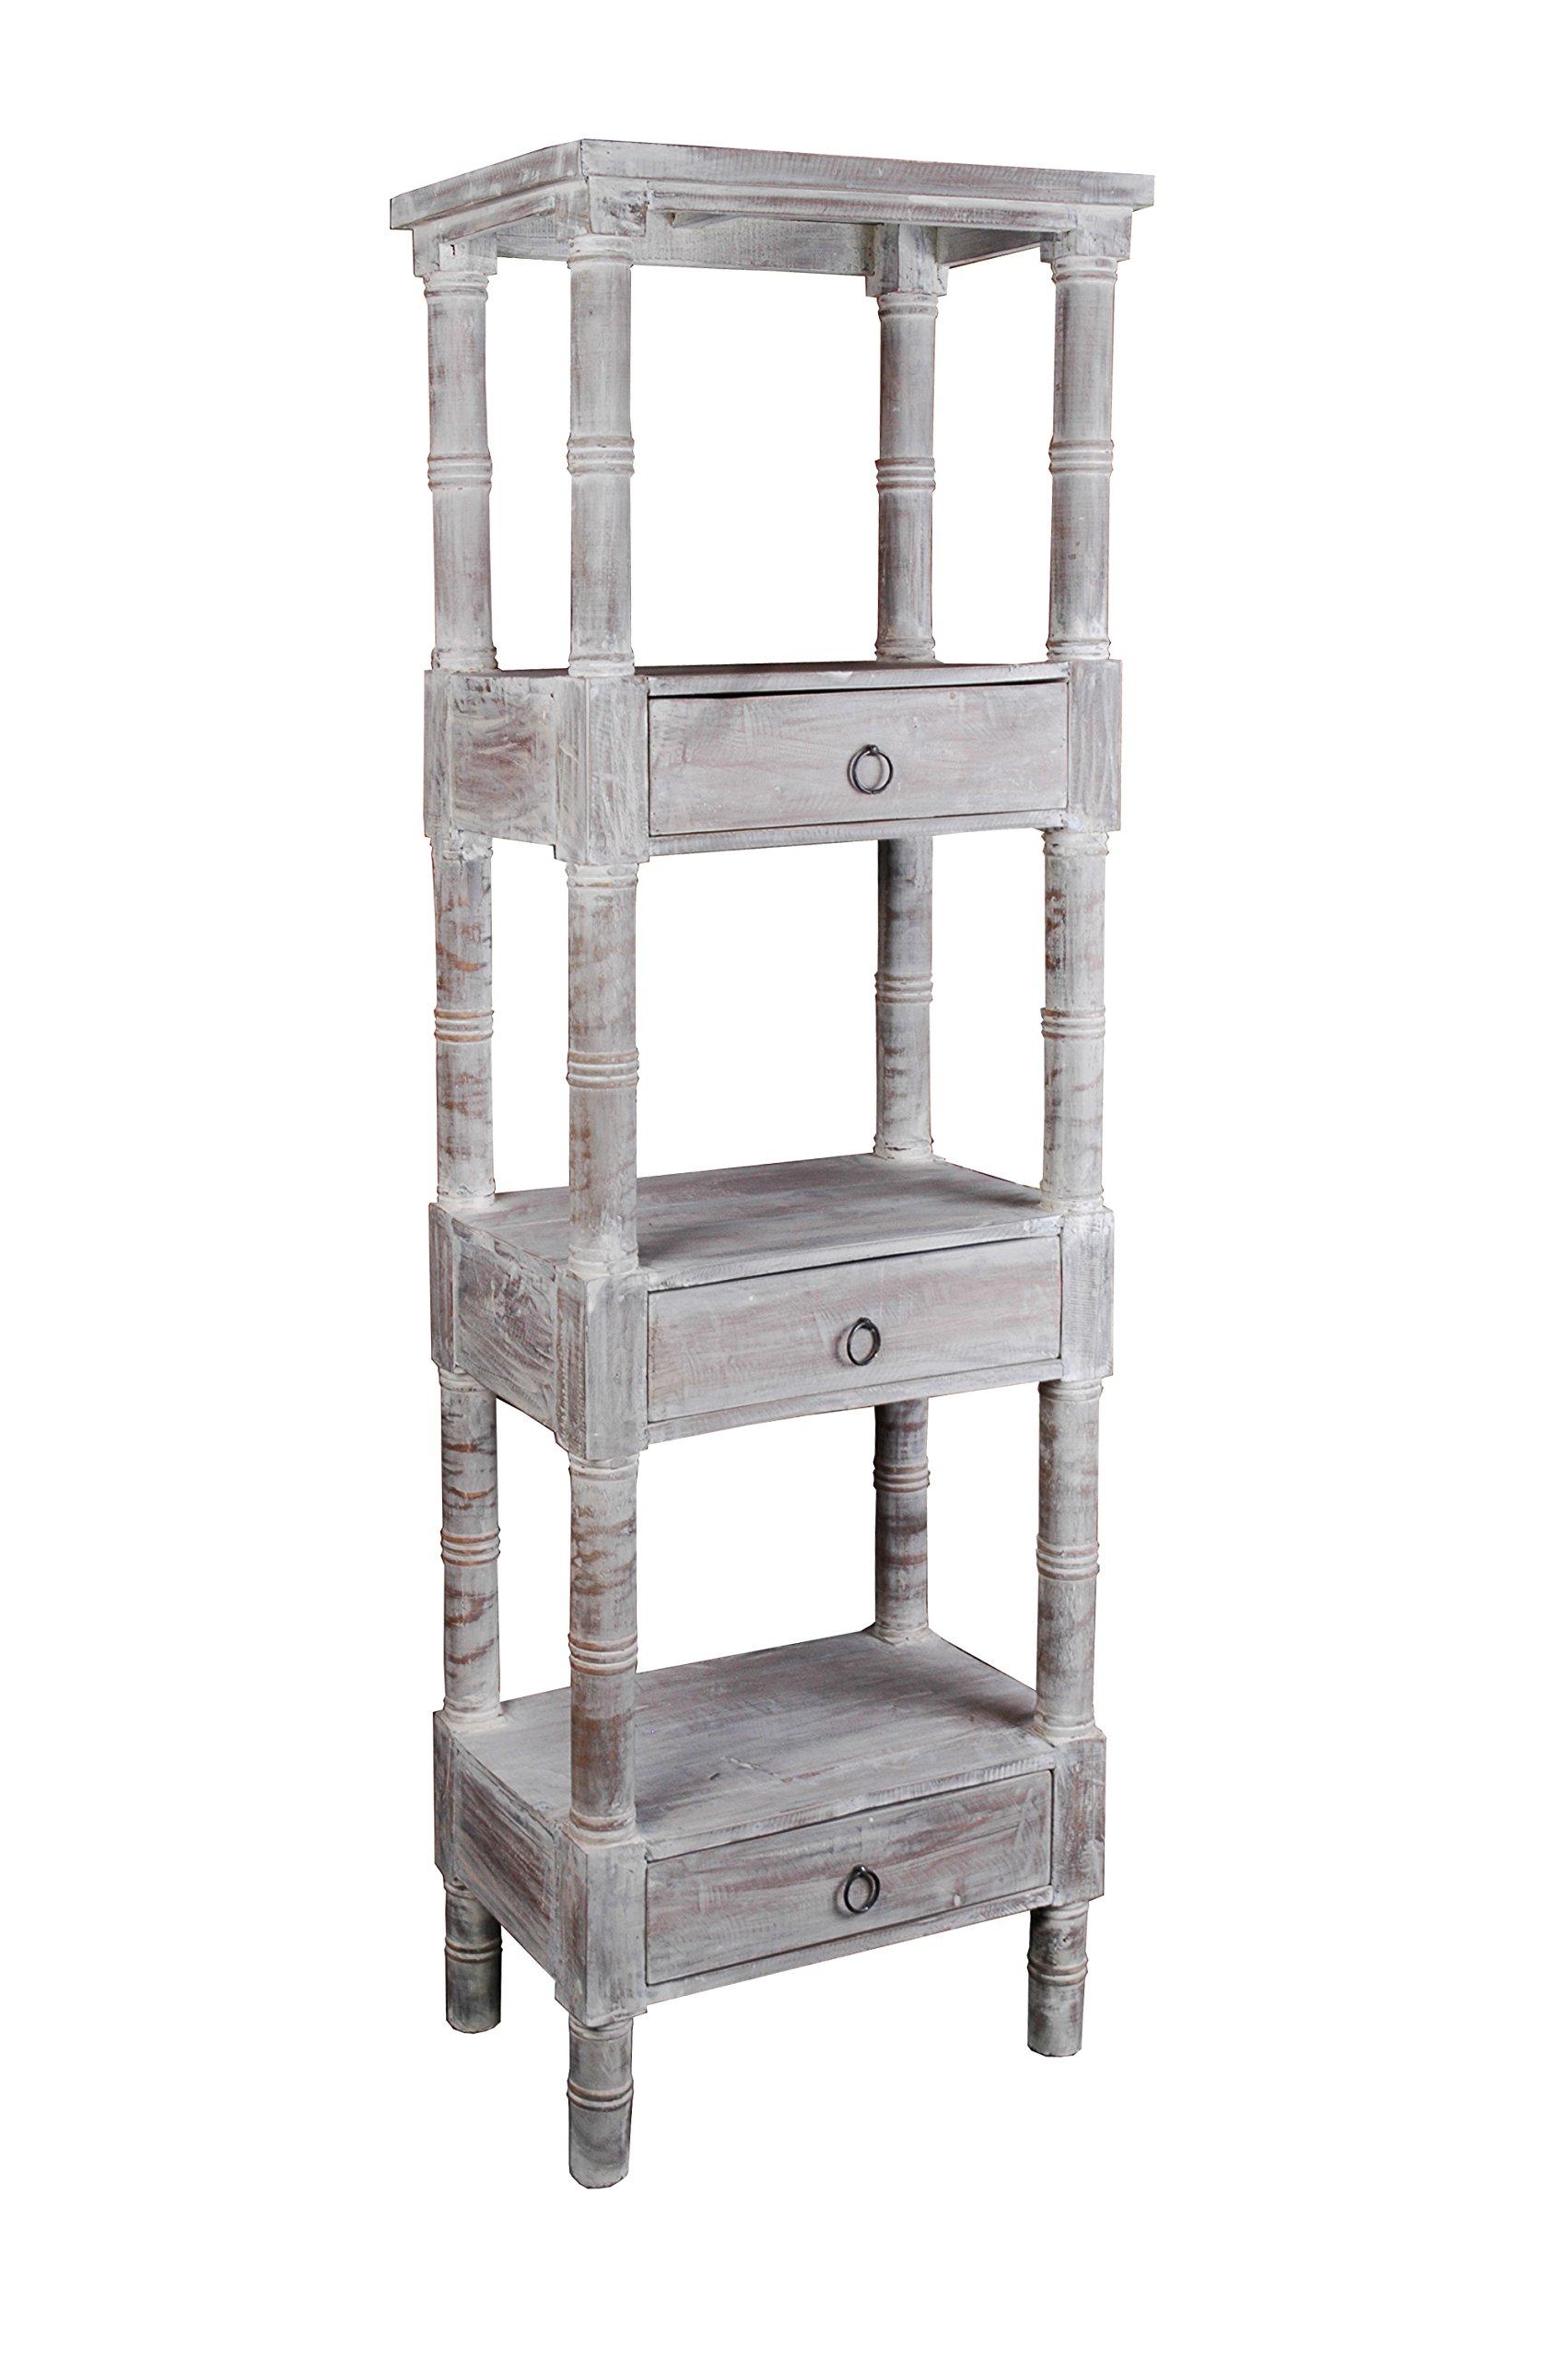 Sunset Trading CC-RAK035S-LW Shabby Chic Cottage Tall Shelf, Three Drawer, Gray Wash